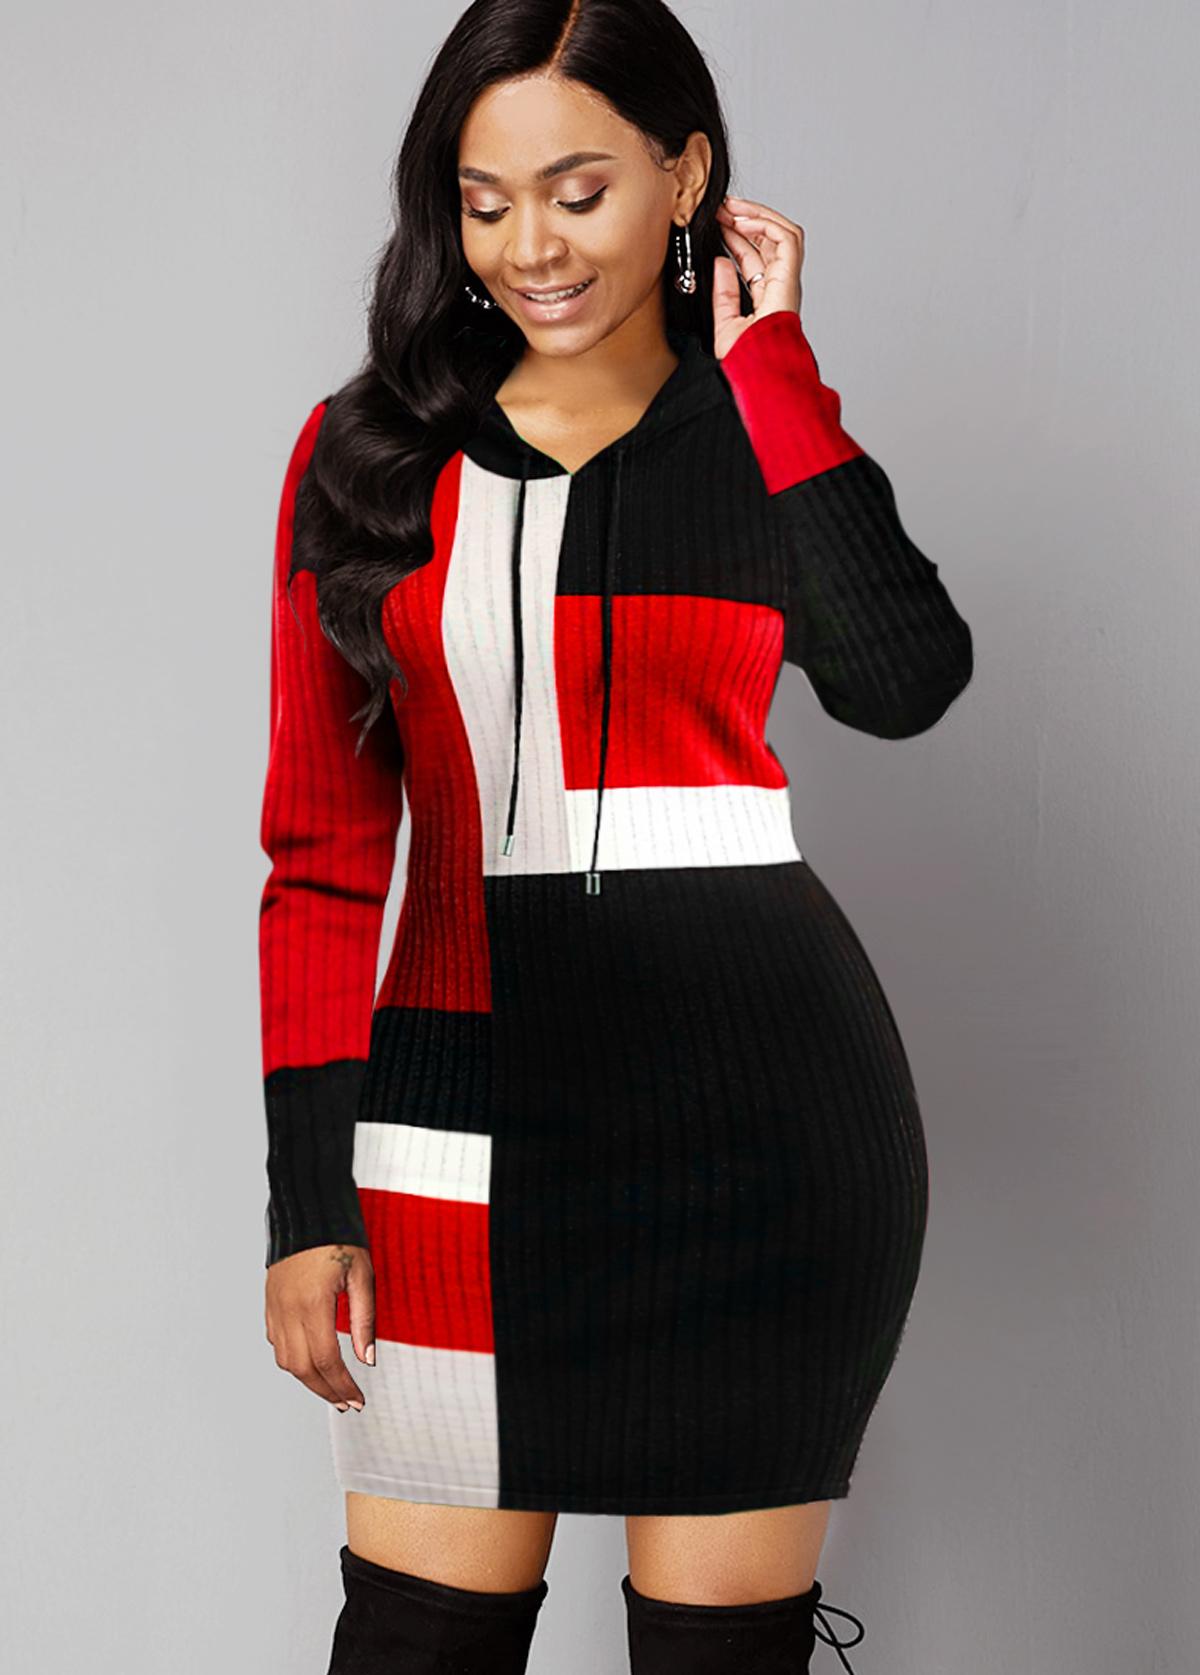 ROTITA Long Sleeve Hooded Collar Contrast Sweater Dress